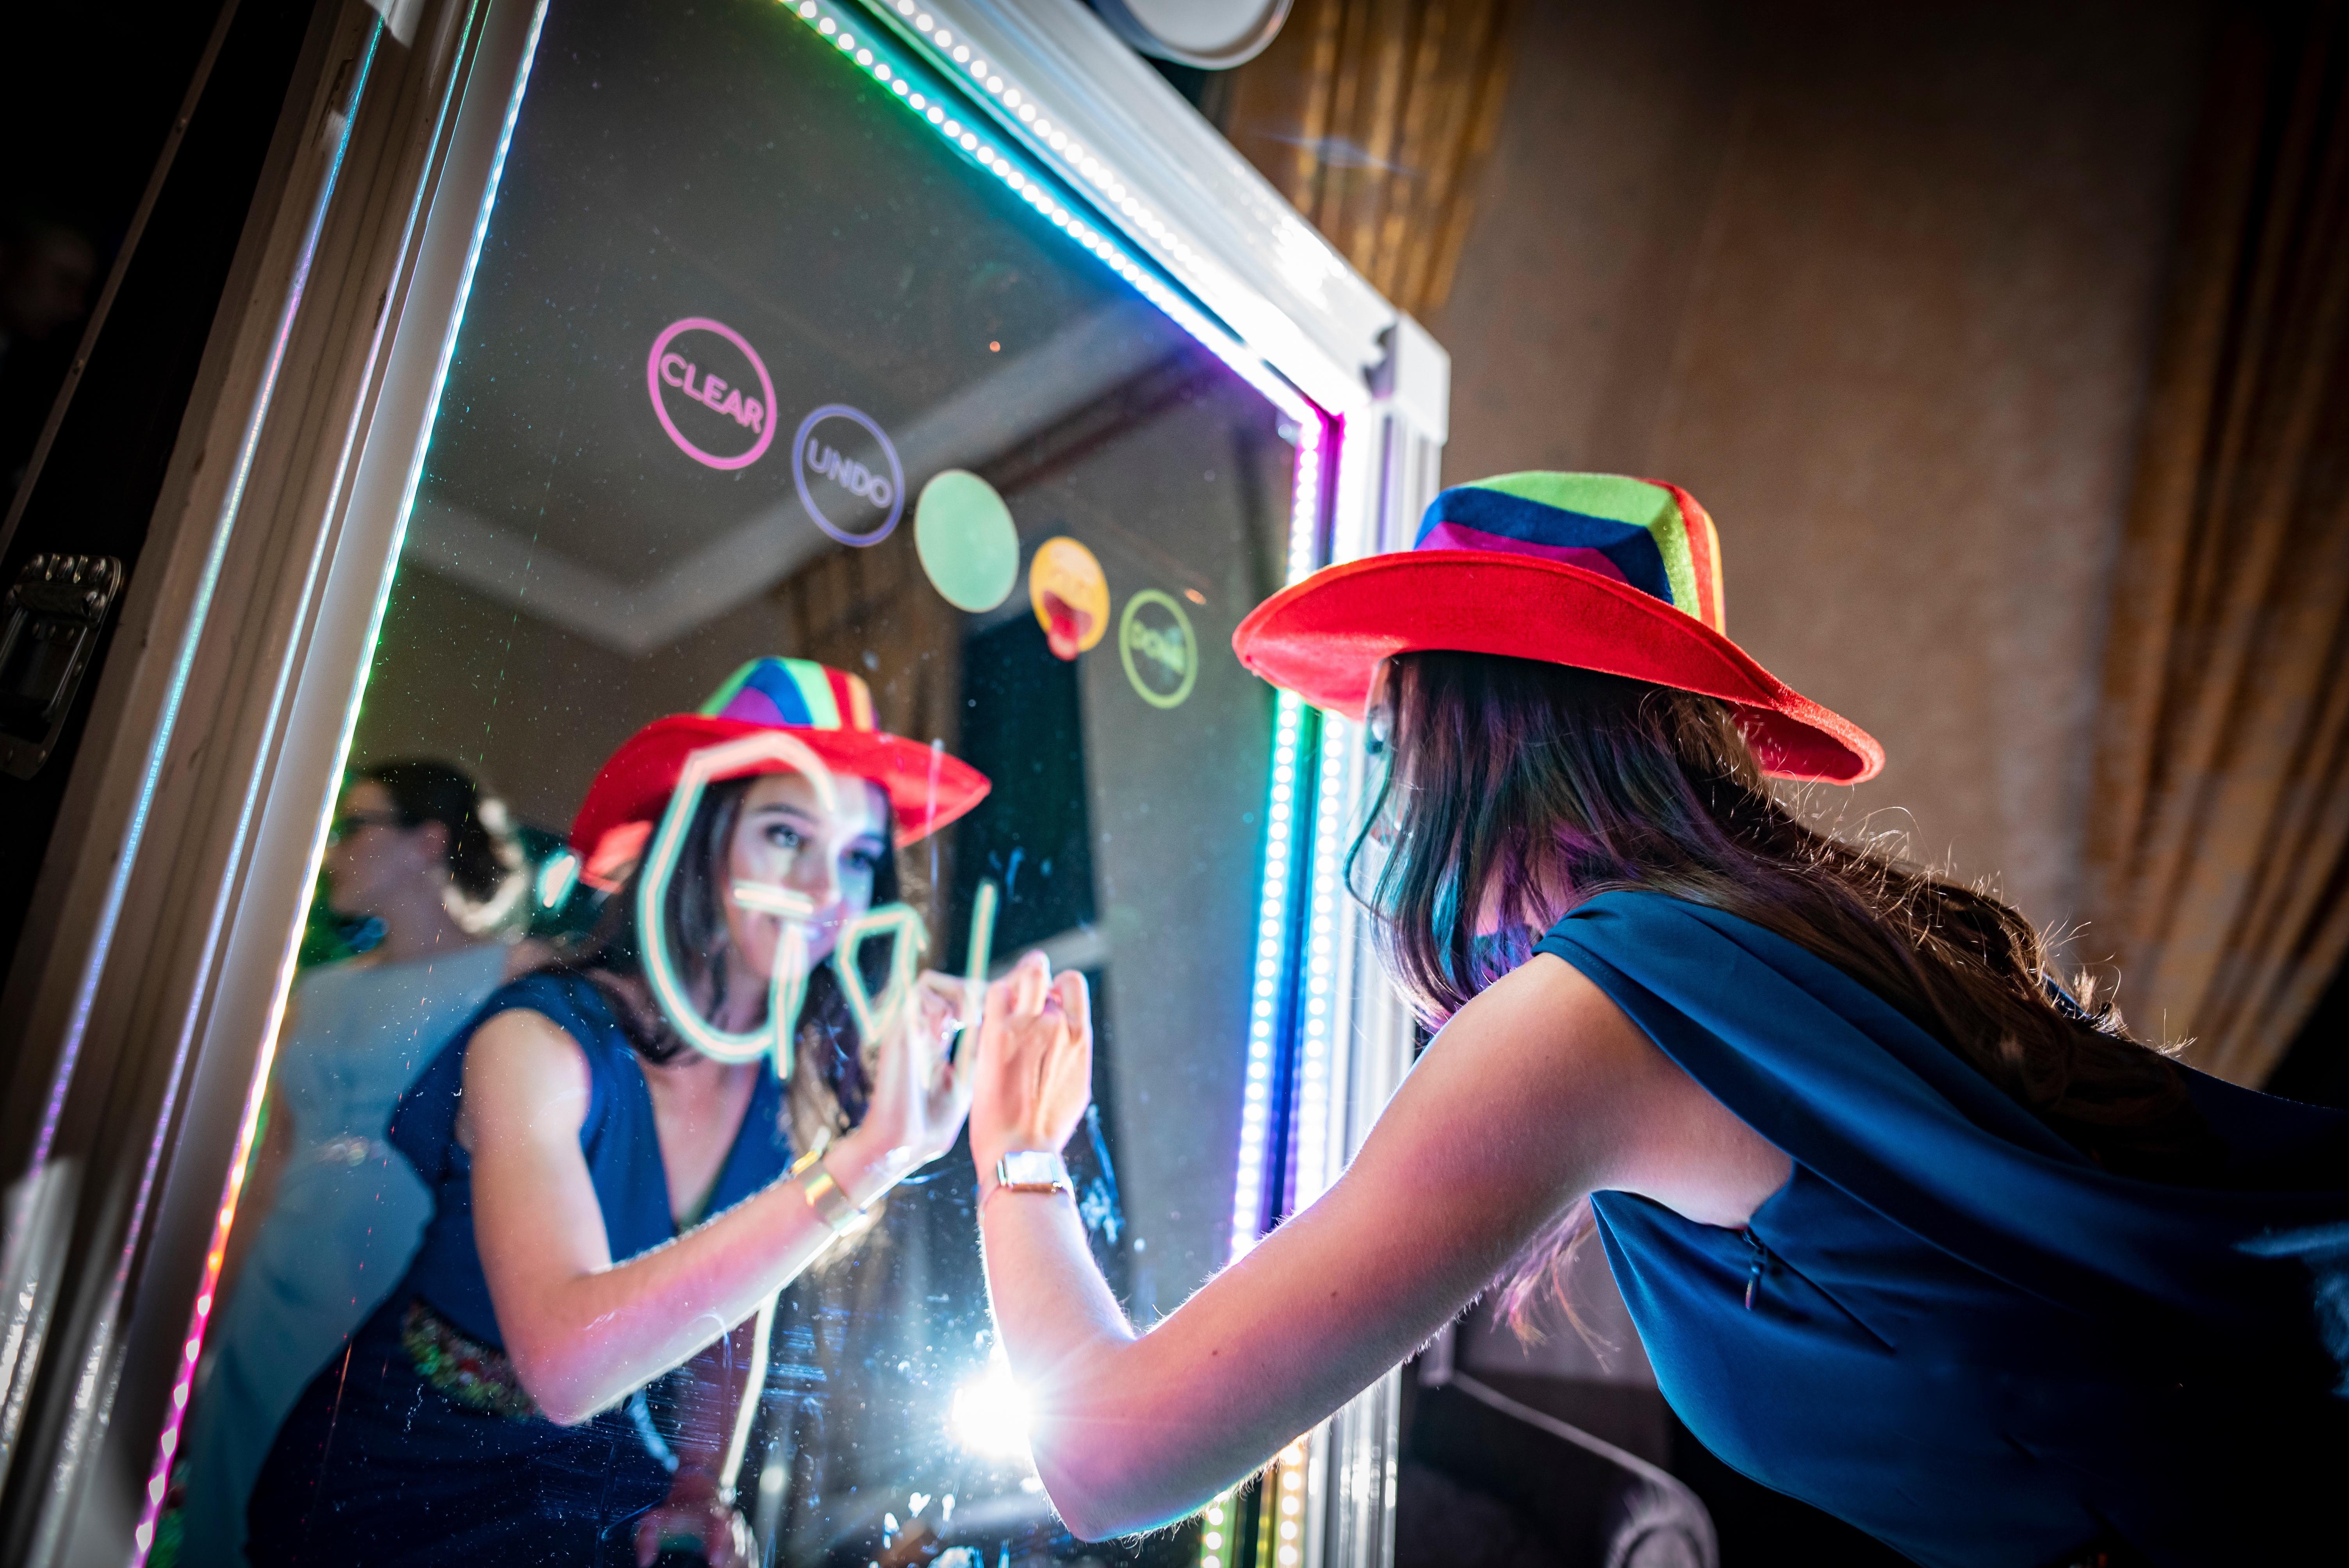 YouPix Event Photobooth Rentals 3 hours